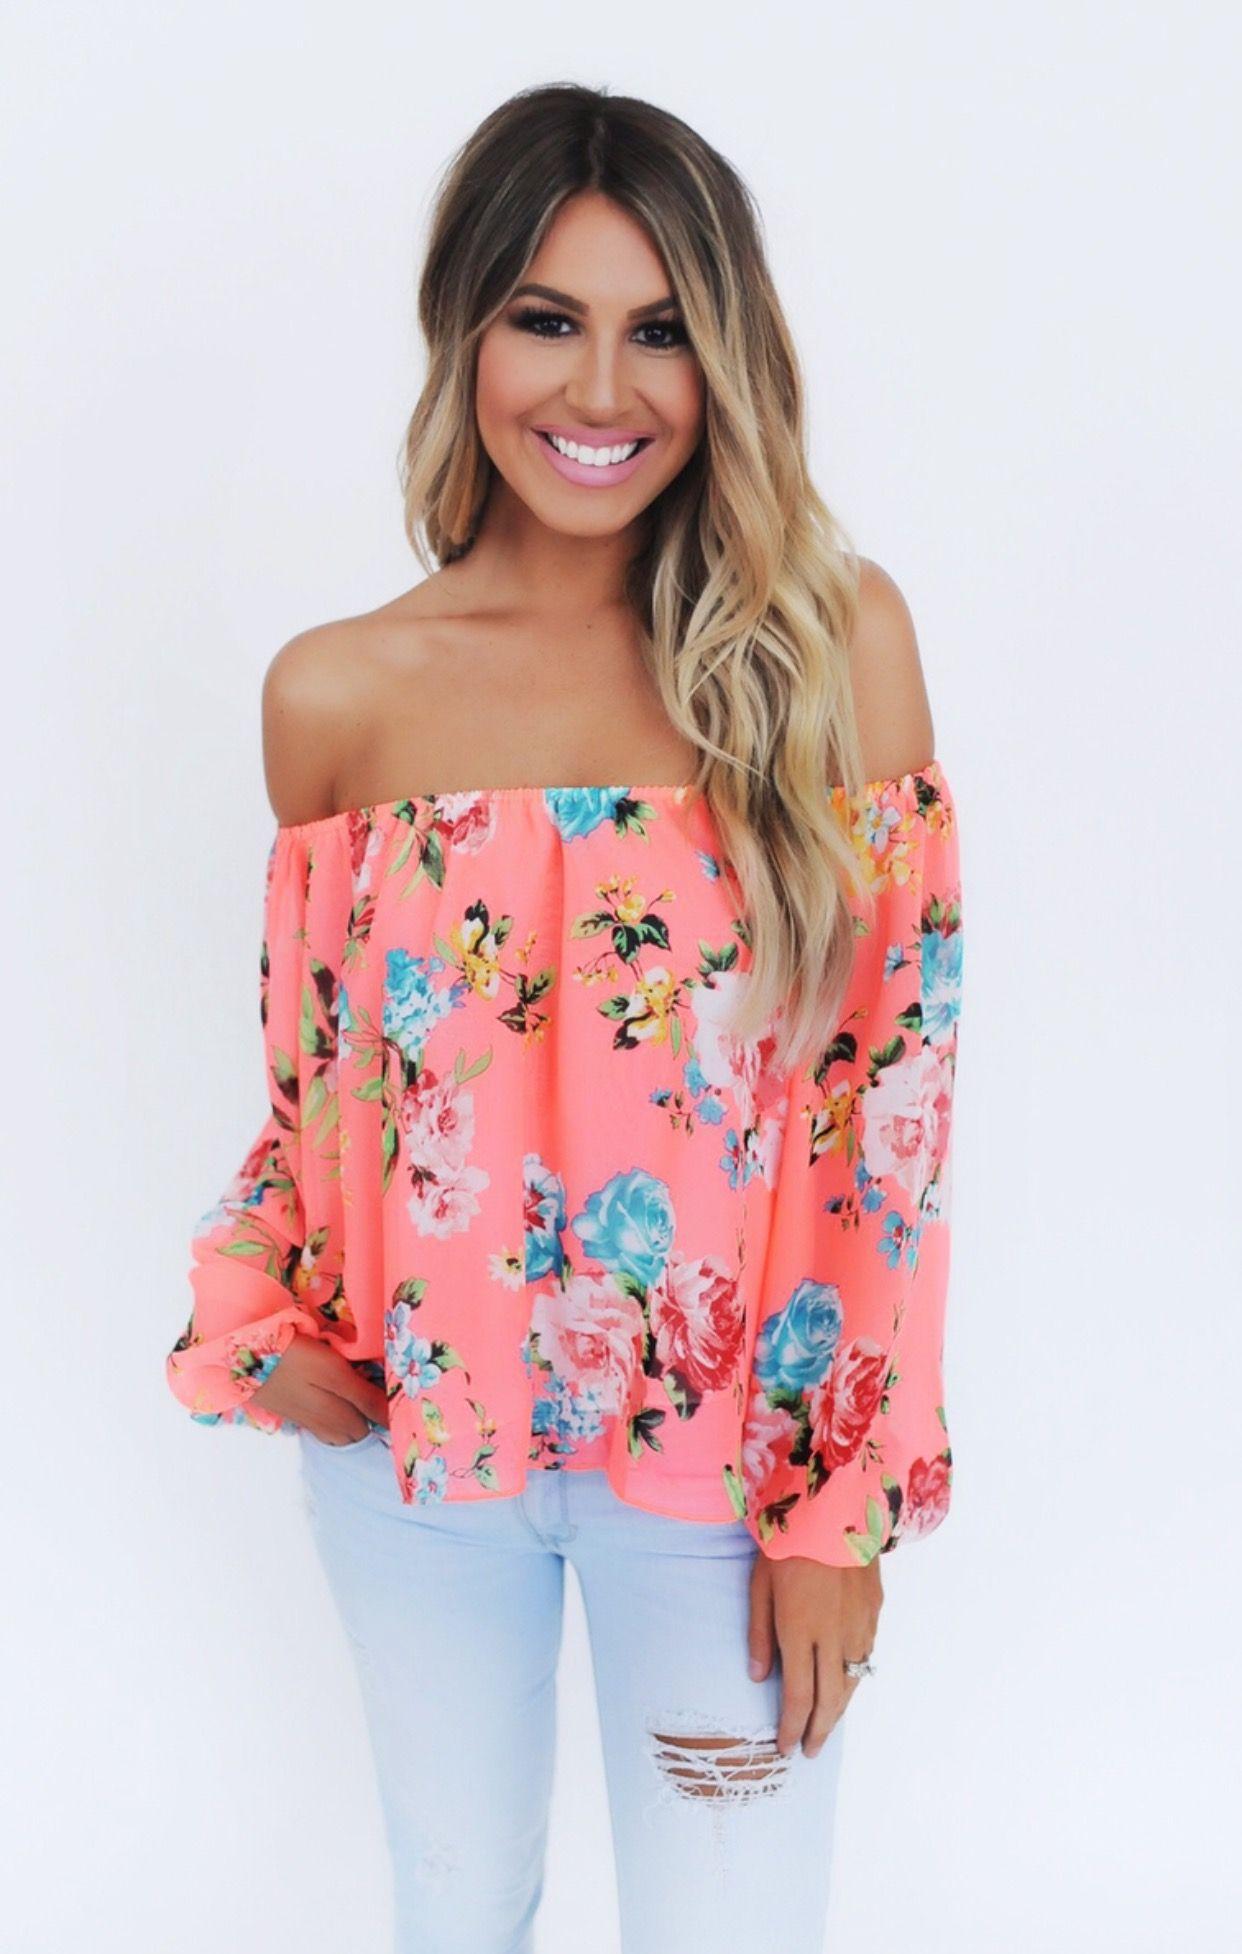 Pin de Sara♕Cárdenas N. en Outfits | Pinterest | Patrones blusas ...